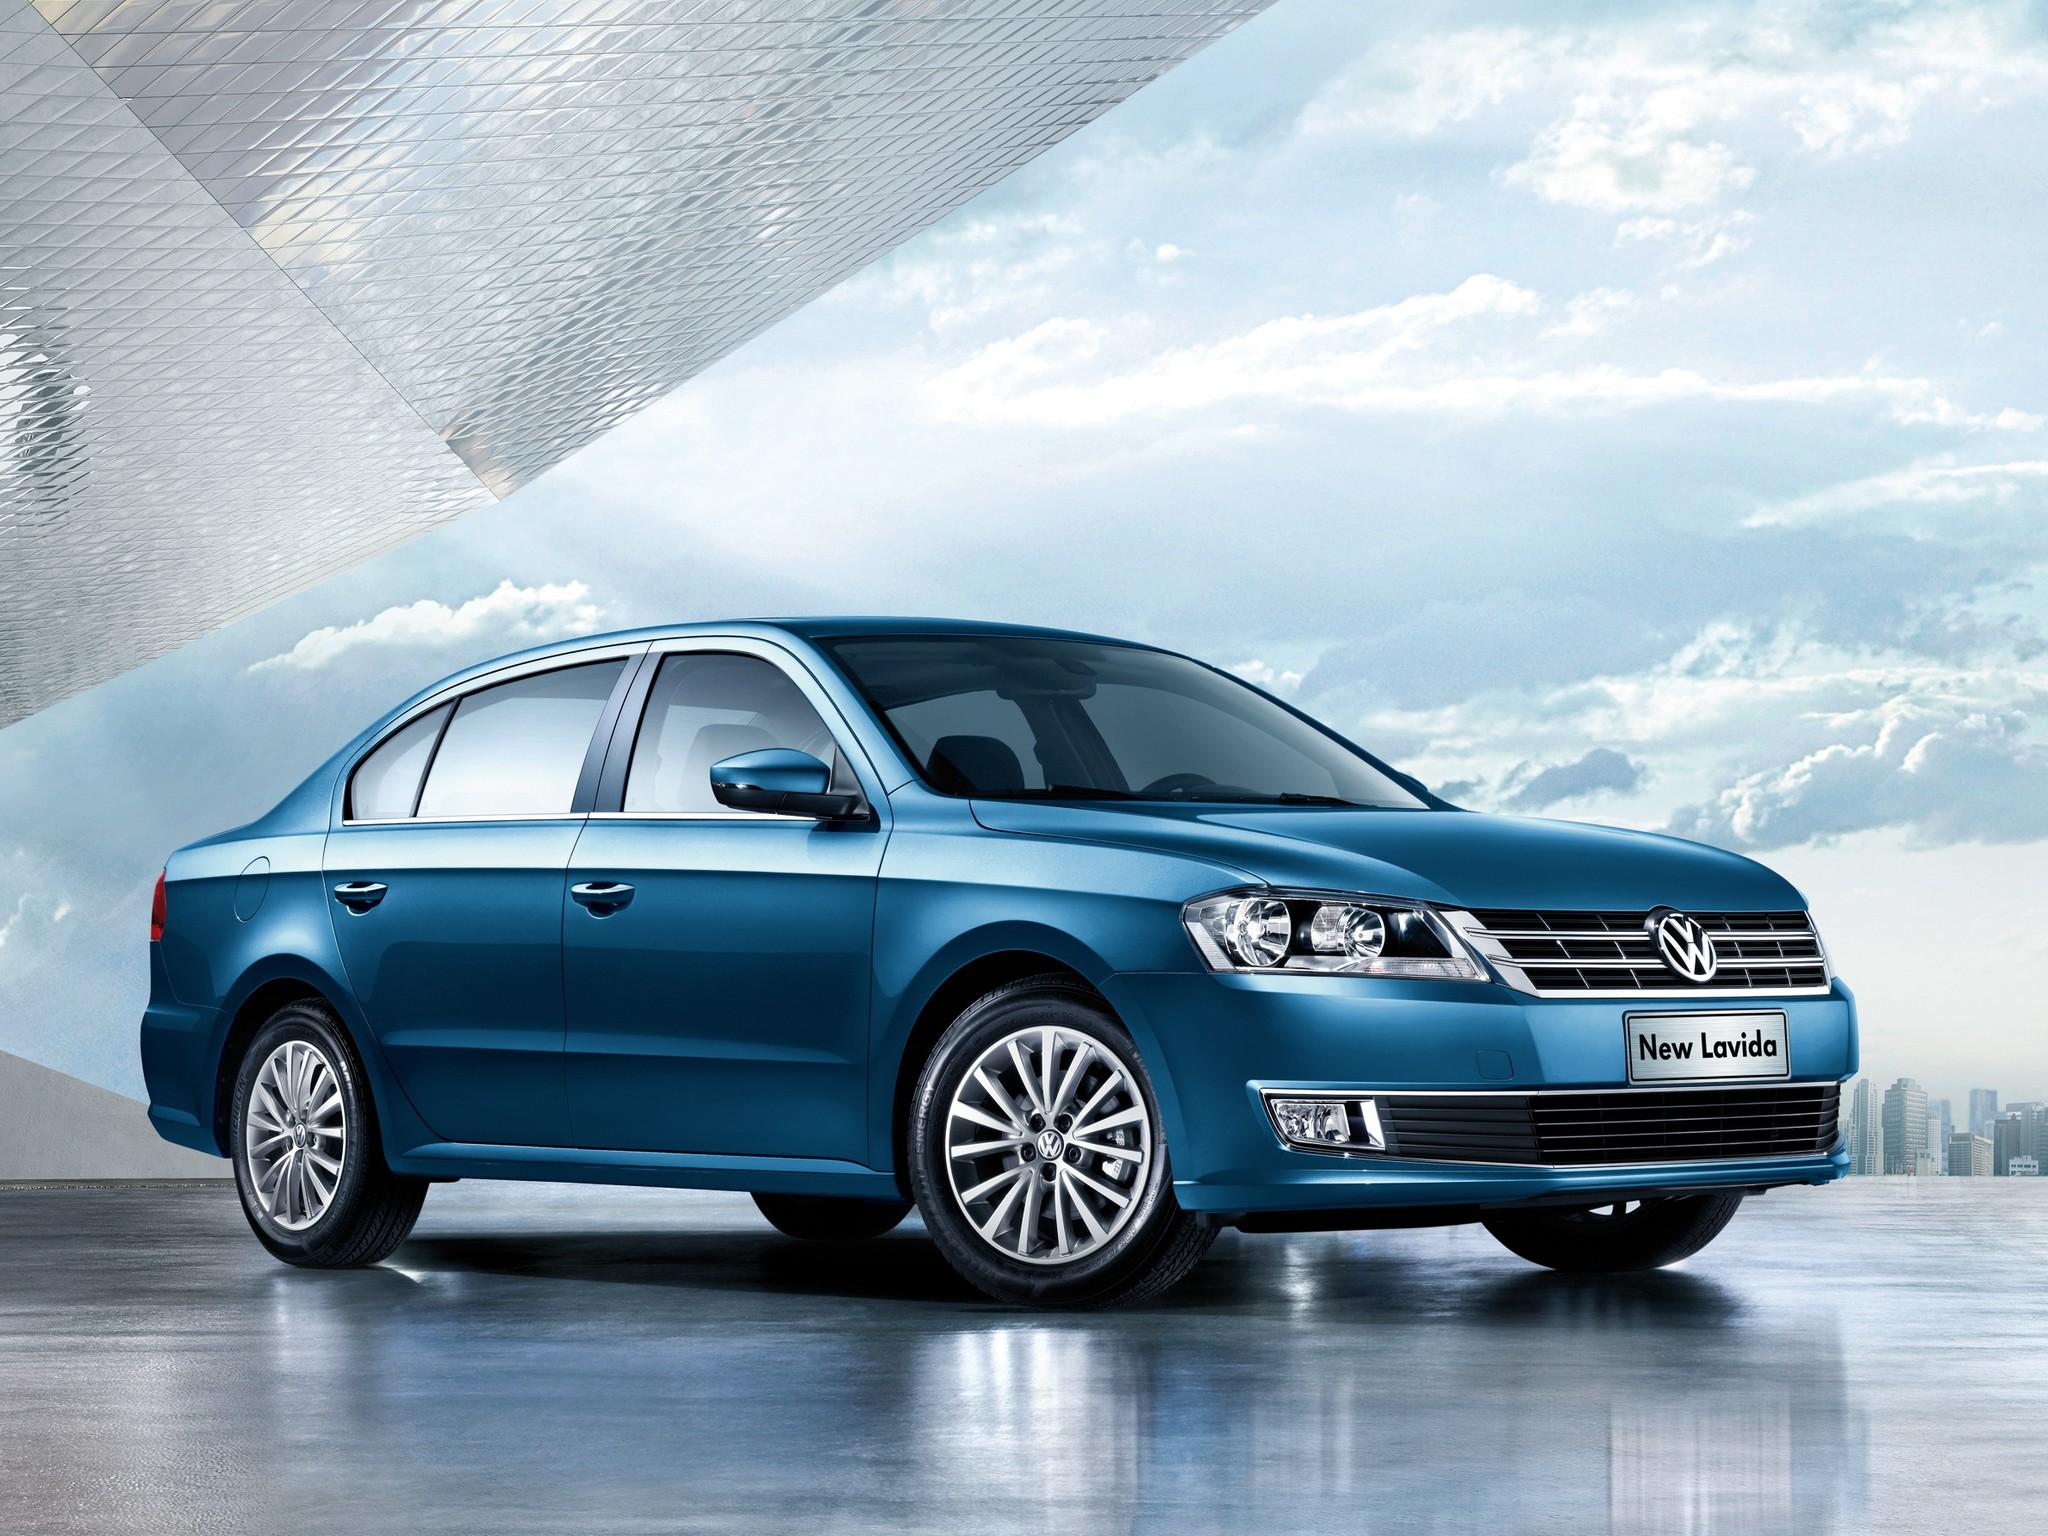 Volkswagen Lavida photos - PhotoGallery with 12 pics ...